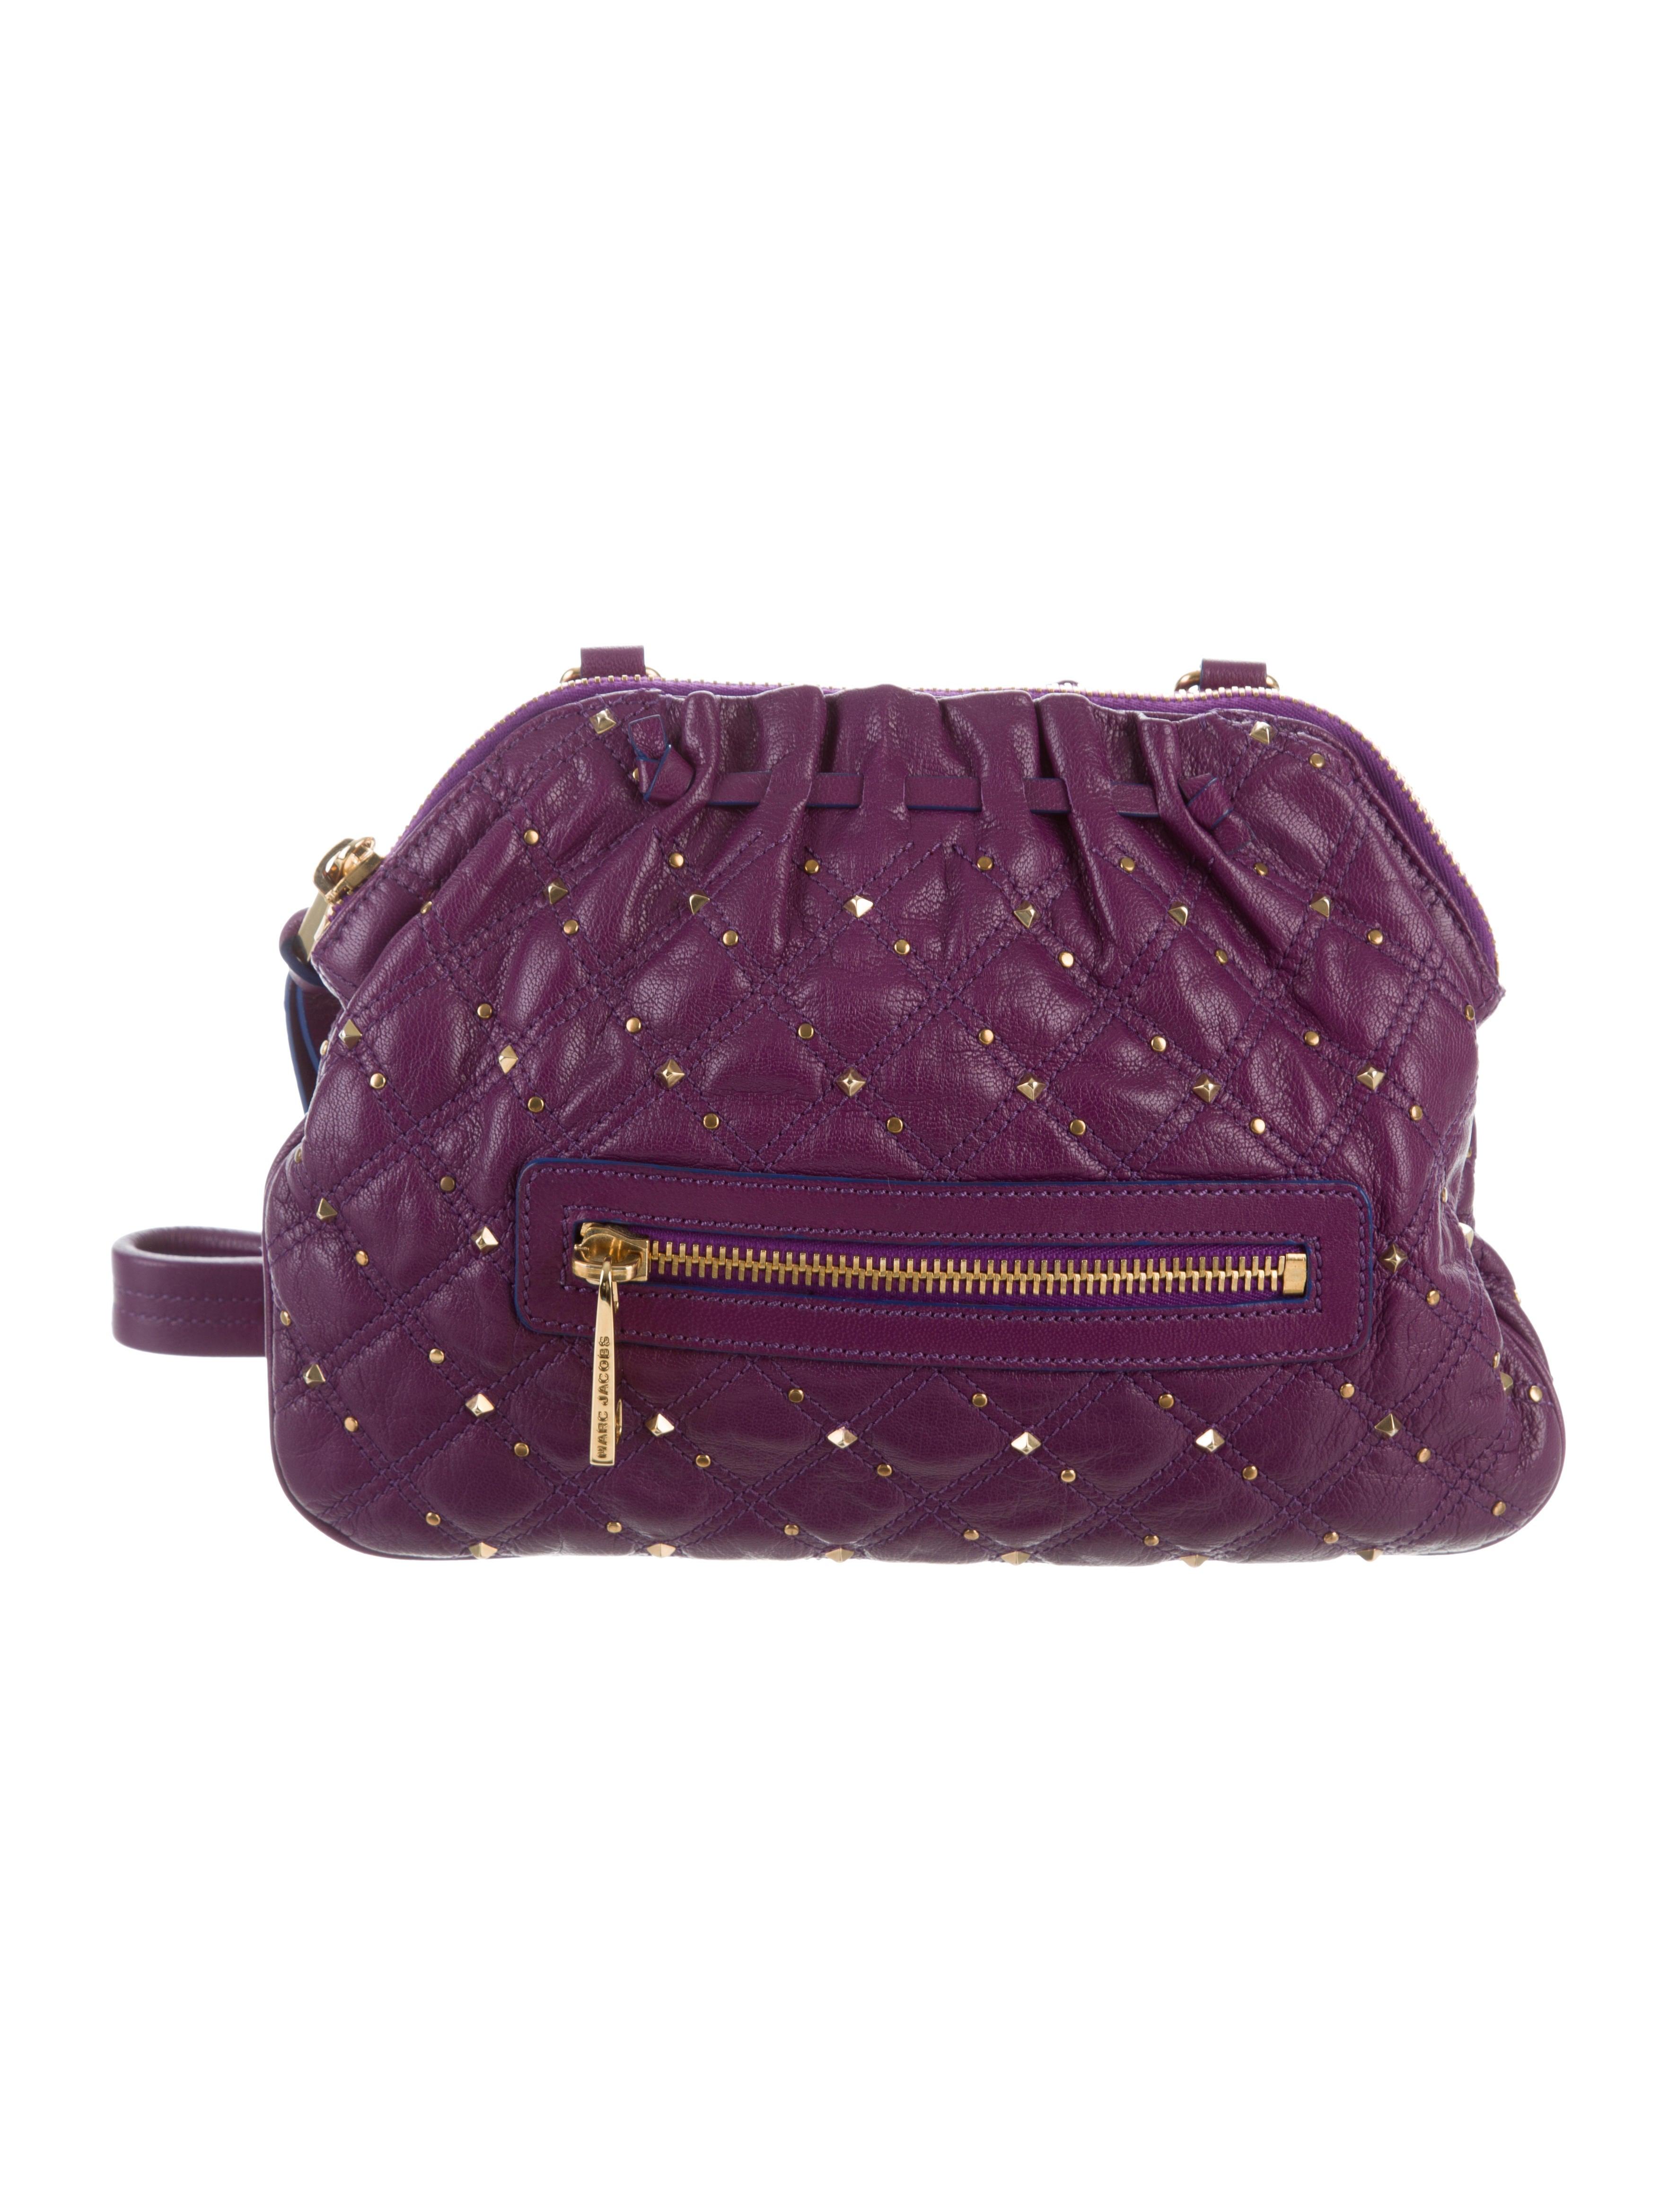 8b70cc427433 Marc Jacobs Quilted Leather Shoulder Bag - Handbags - MAR64634